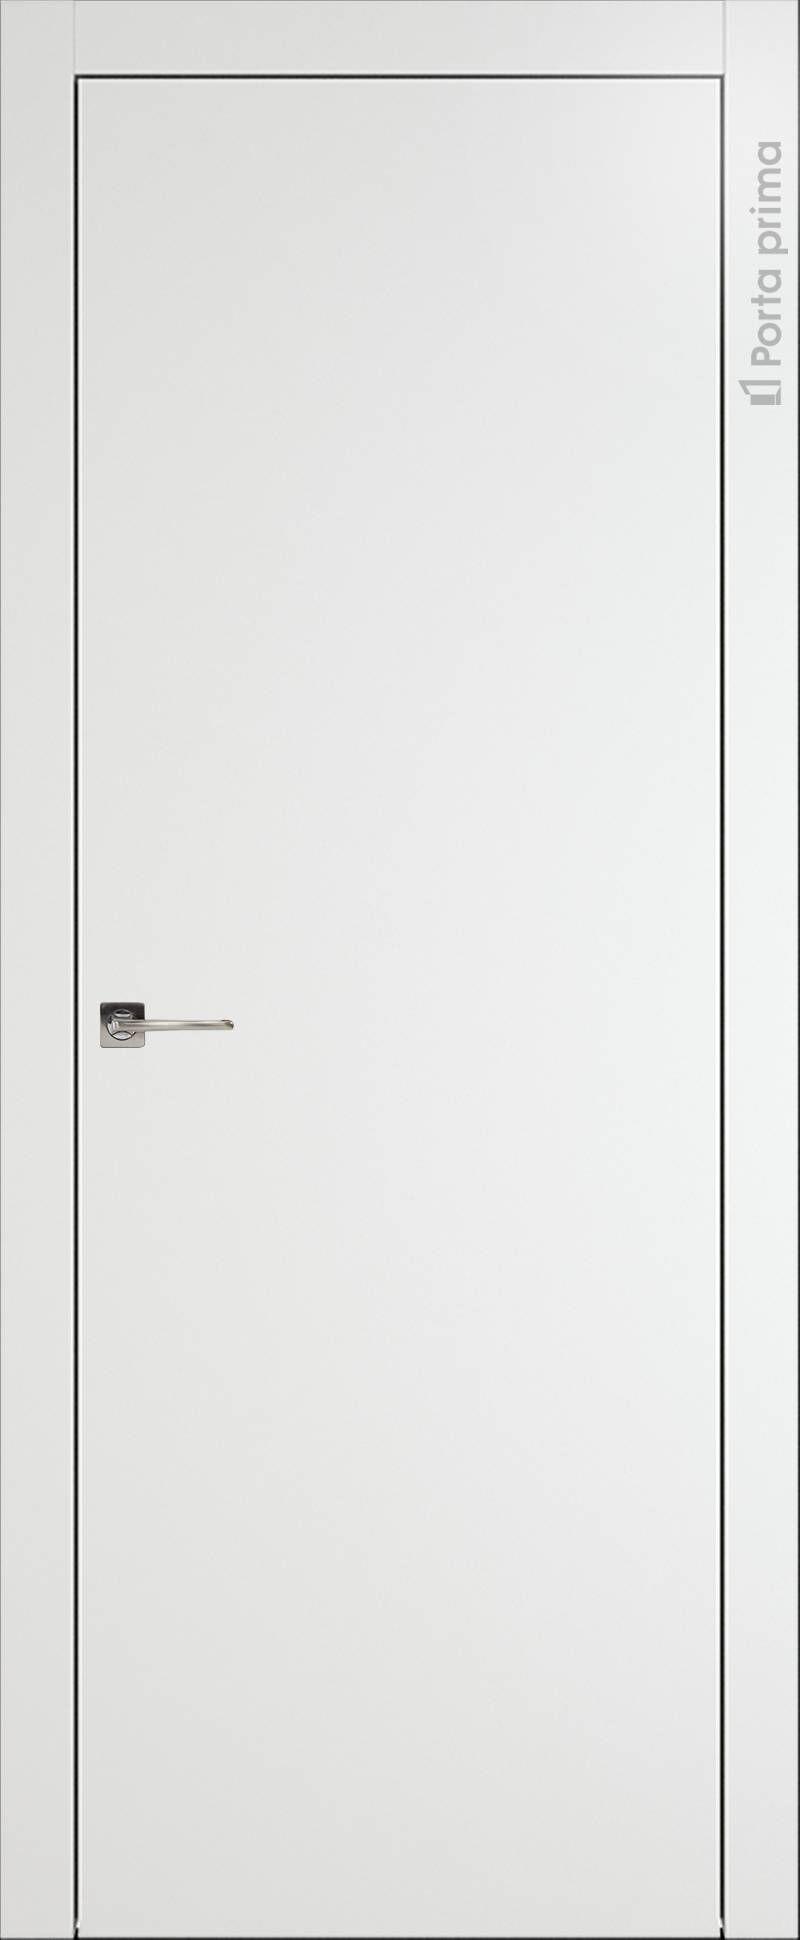 Tivoli А-5 цвет - Белая эмаль (RAL 9003) Без стекла (ДГ)